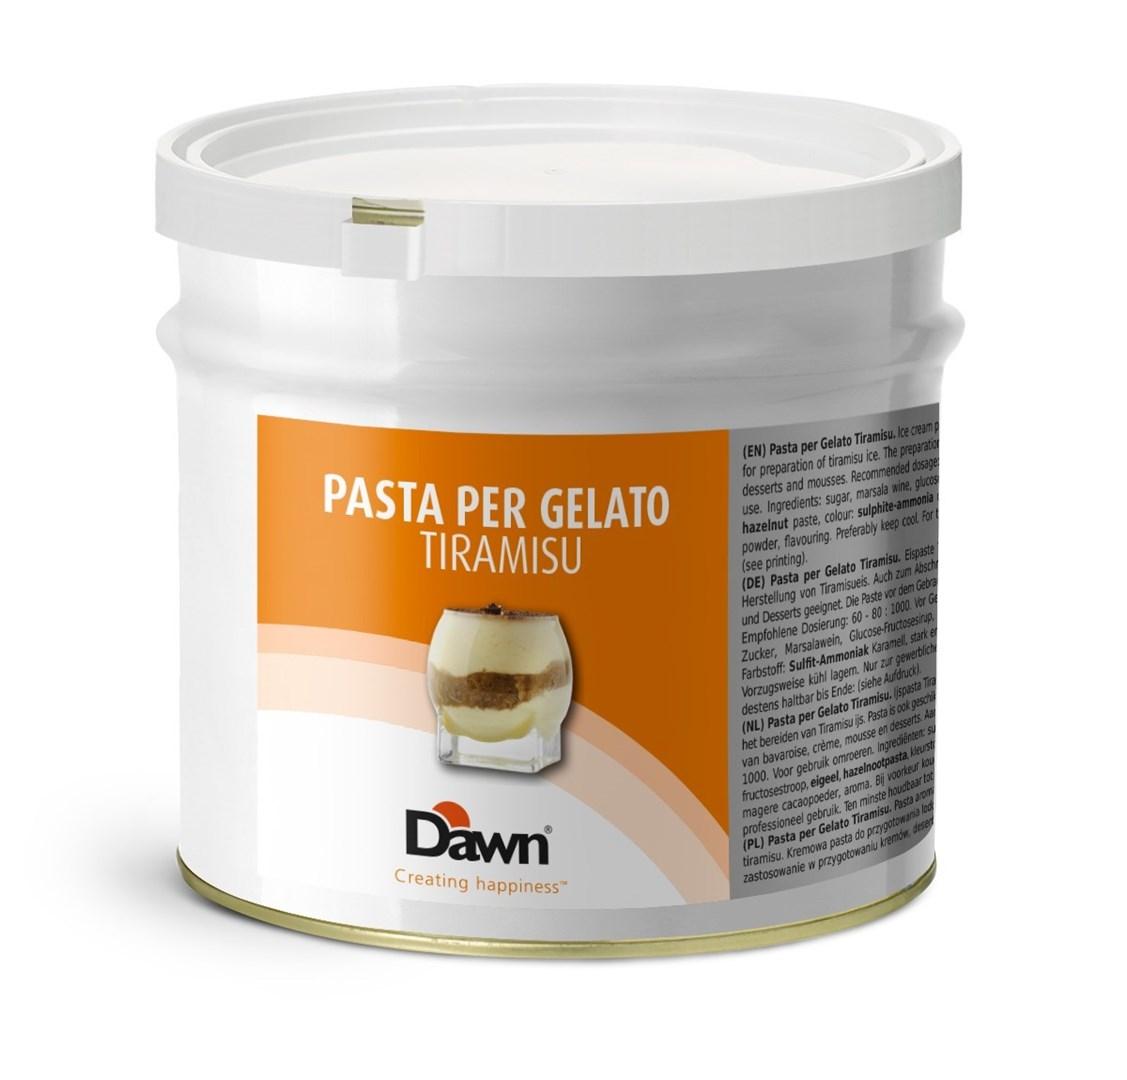 Productafbeelding Dawn Pasta Per Gelato Tiramisu 3,5 kg blik